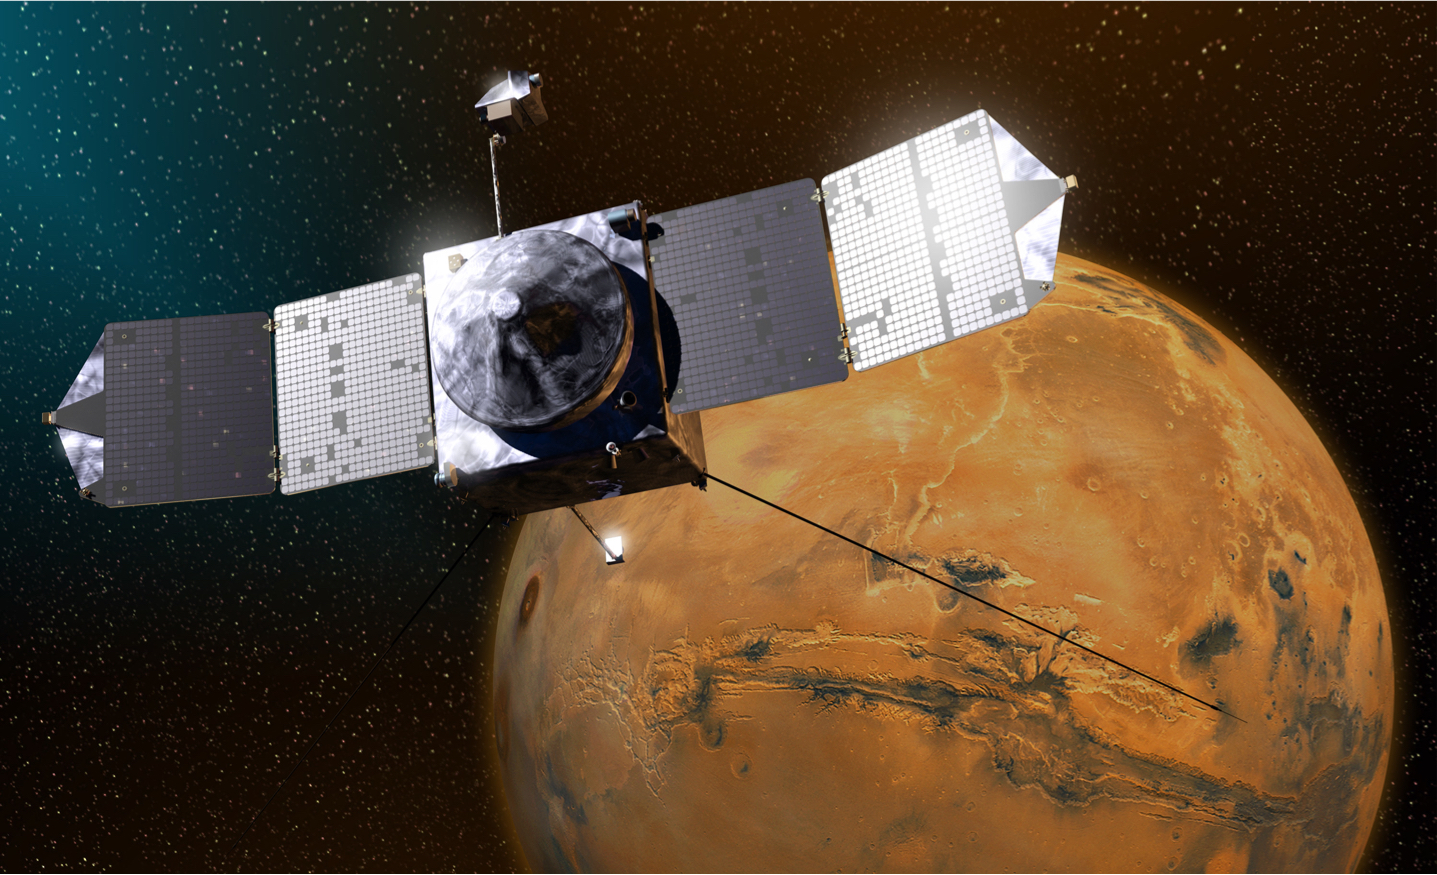 NASA manuevers MAVEN to prevent collision with Mars moon Phobos